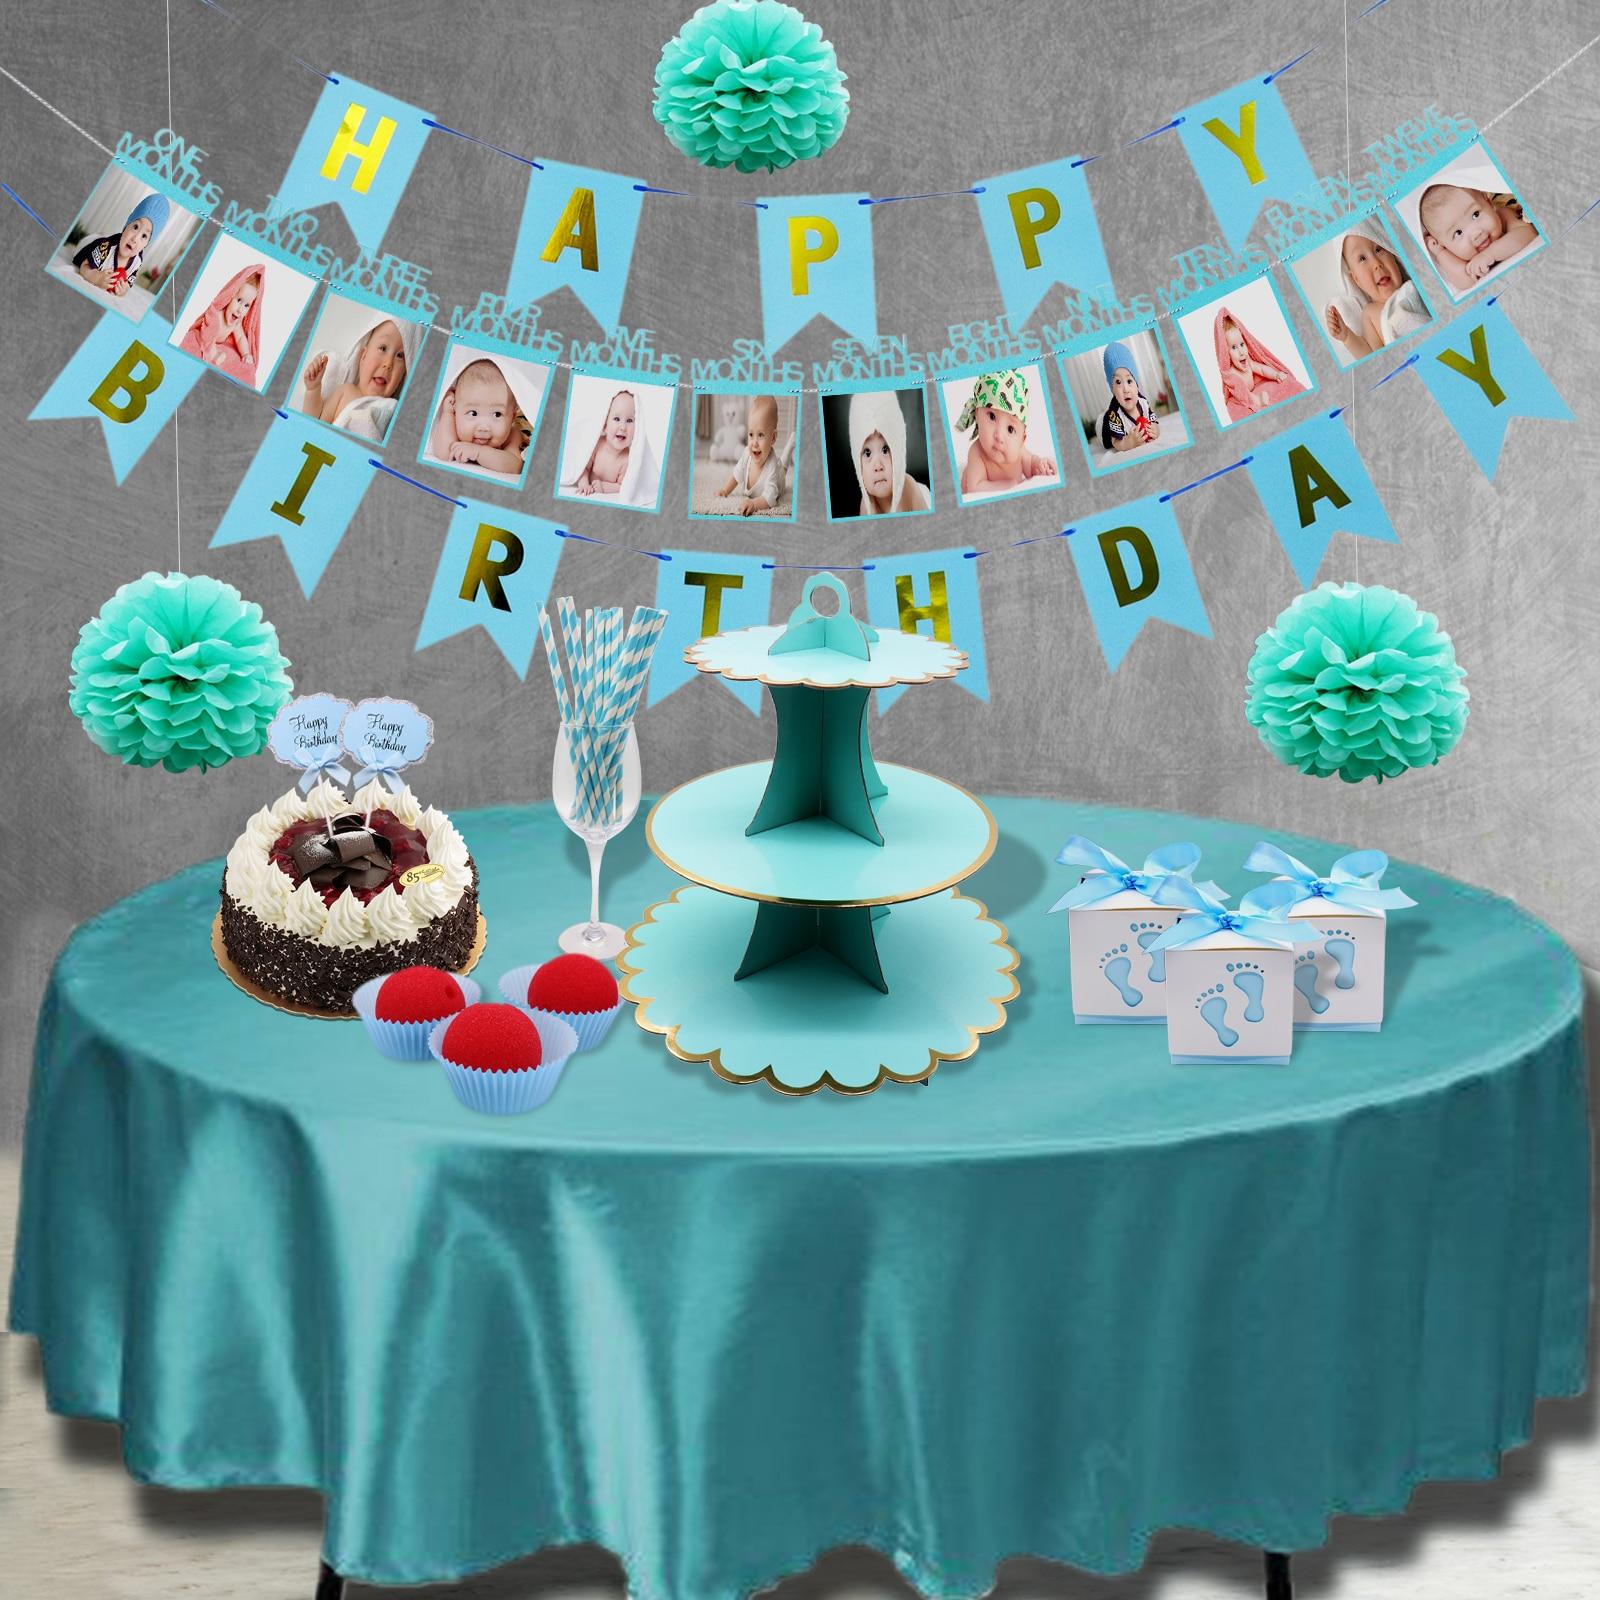 It's a Boy Blue Theme Birthday Party Decoration Foil ...